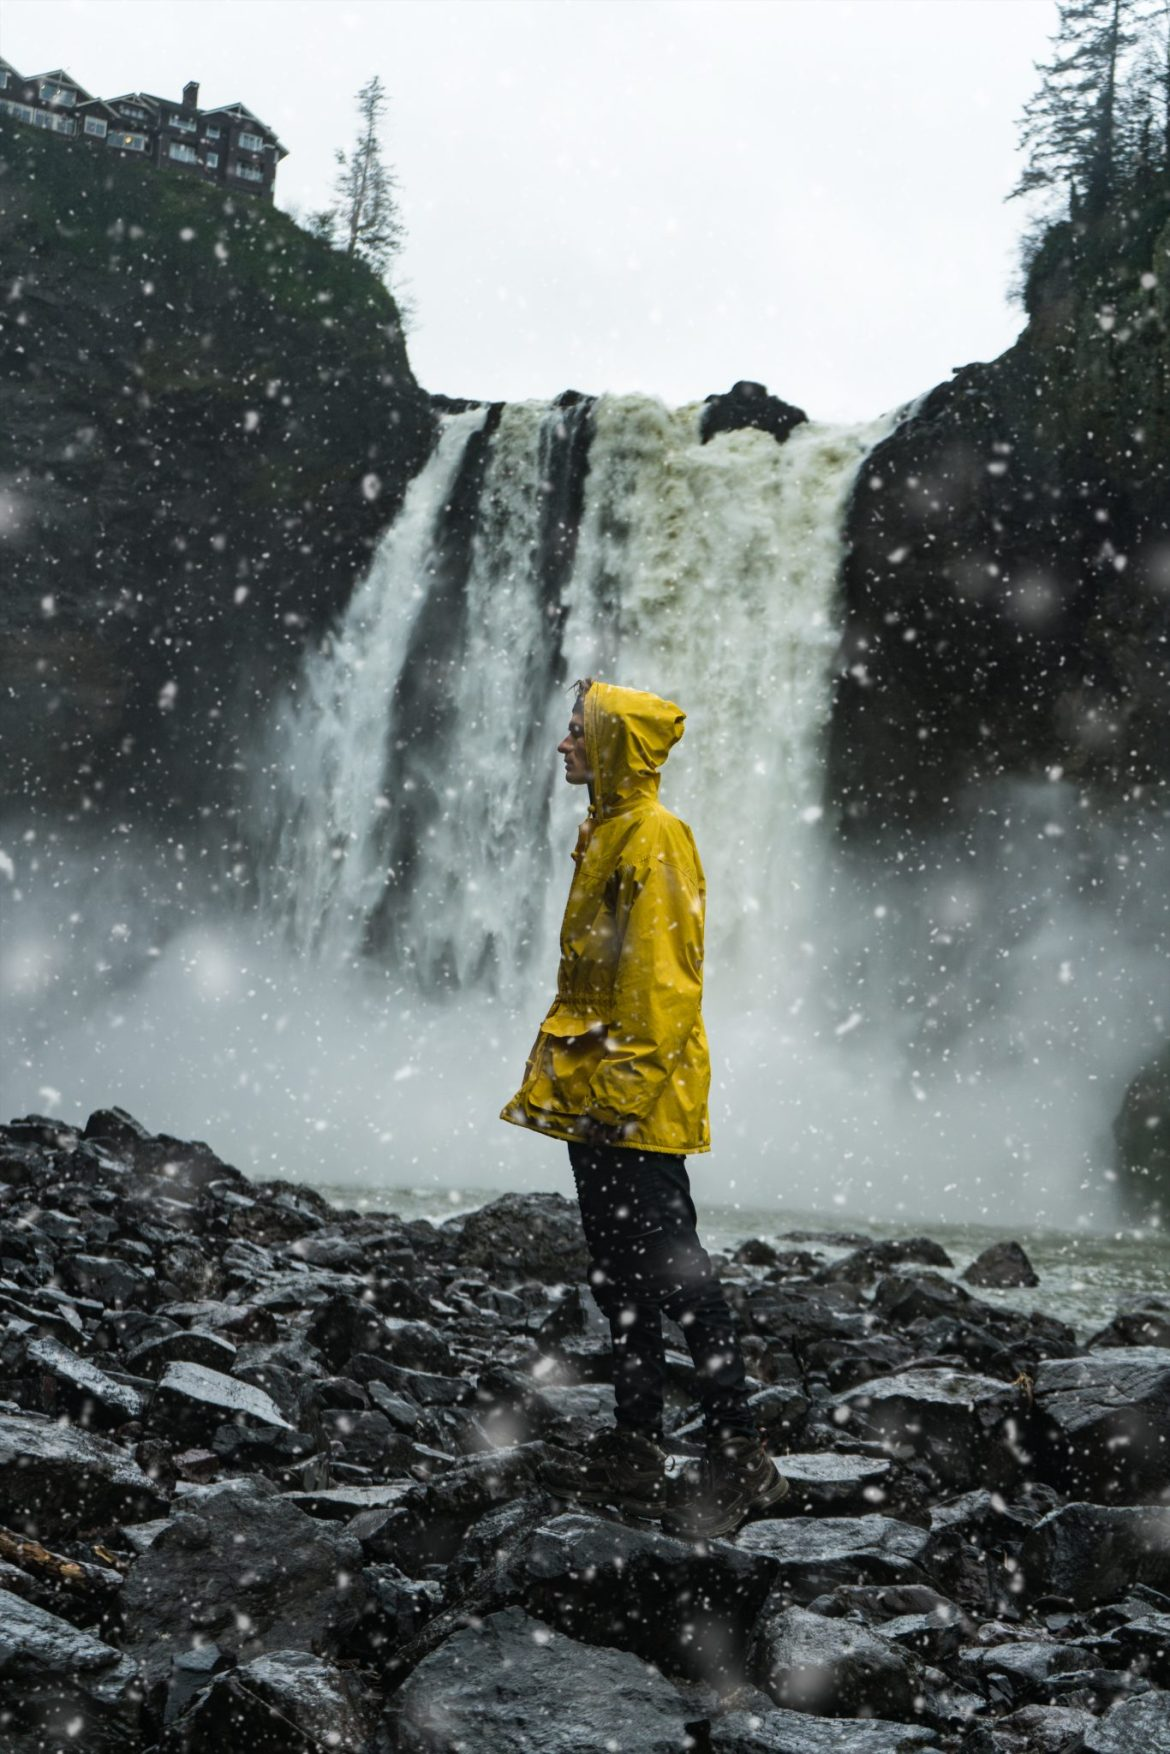 Snoqualmie Falls, Seattle, Washington